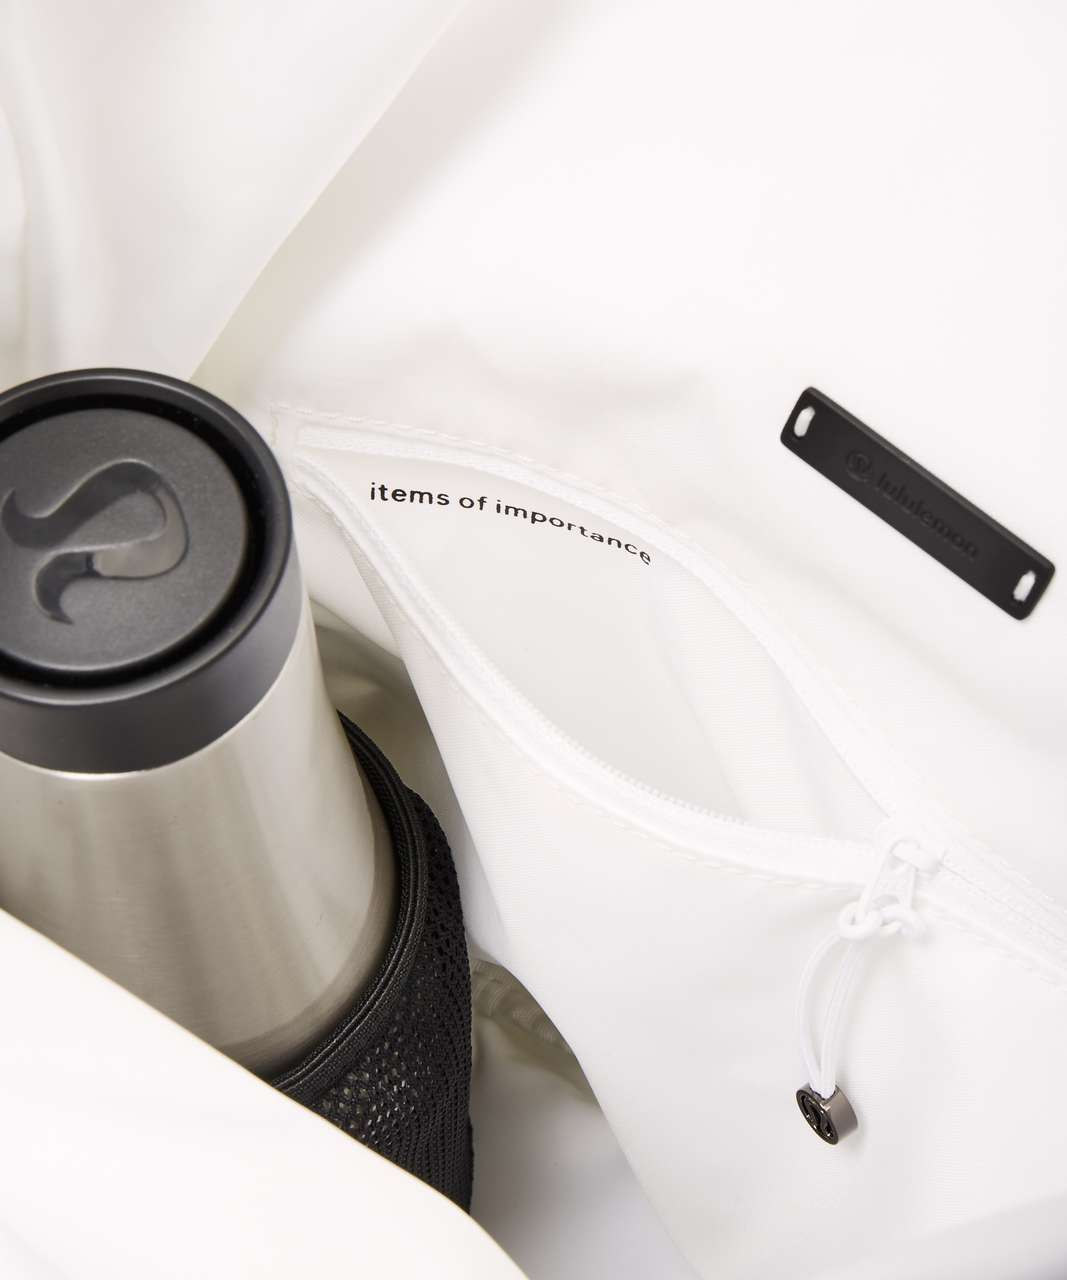 Lululemon Carry Onward Rucksack Mini *9L - White / Black